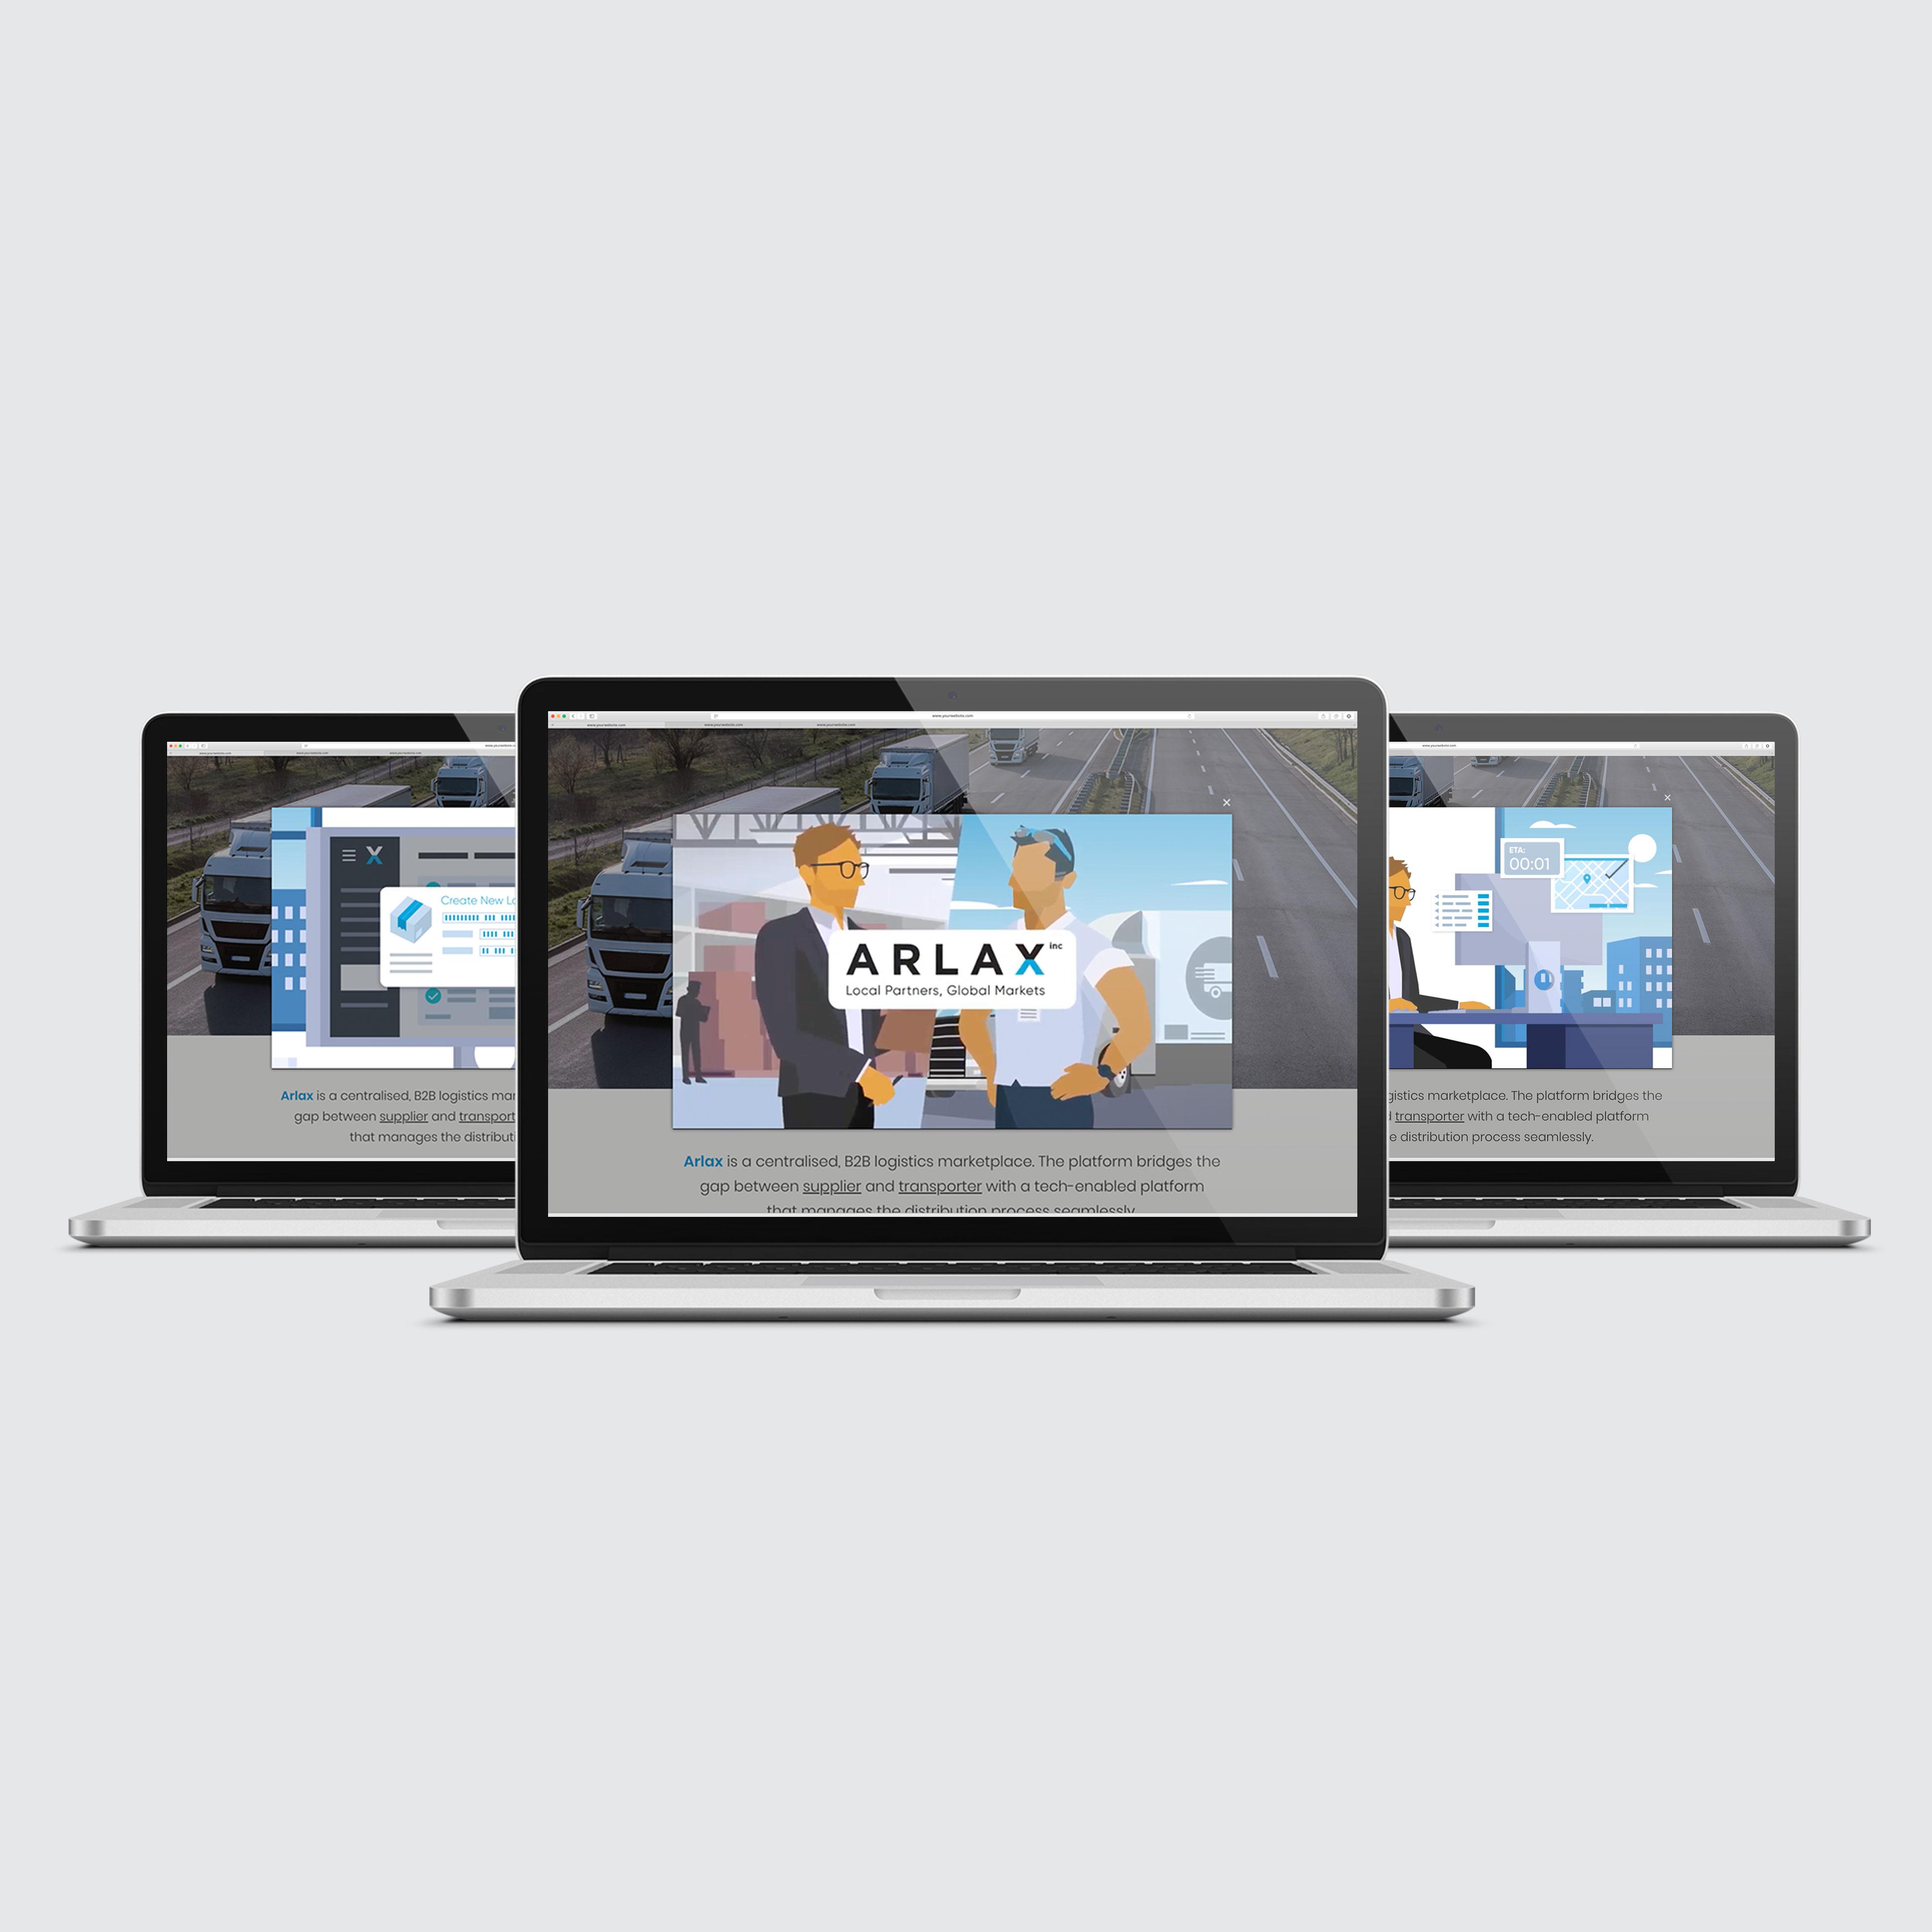 Pure Blog Post Marketing Through Animation